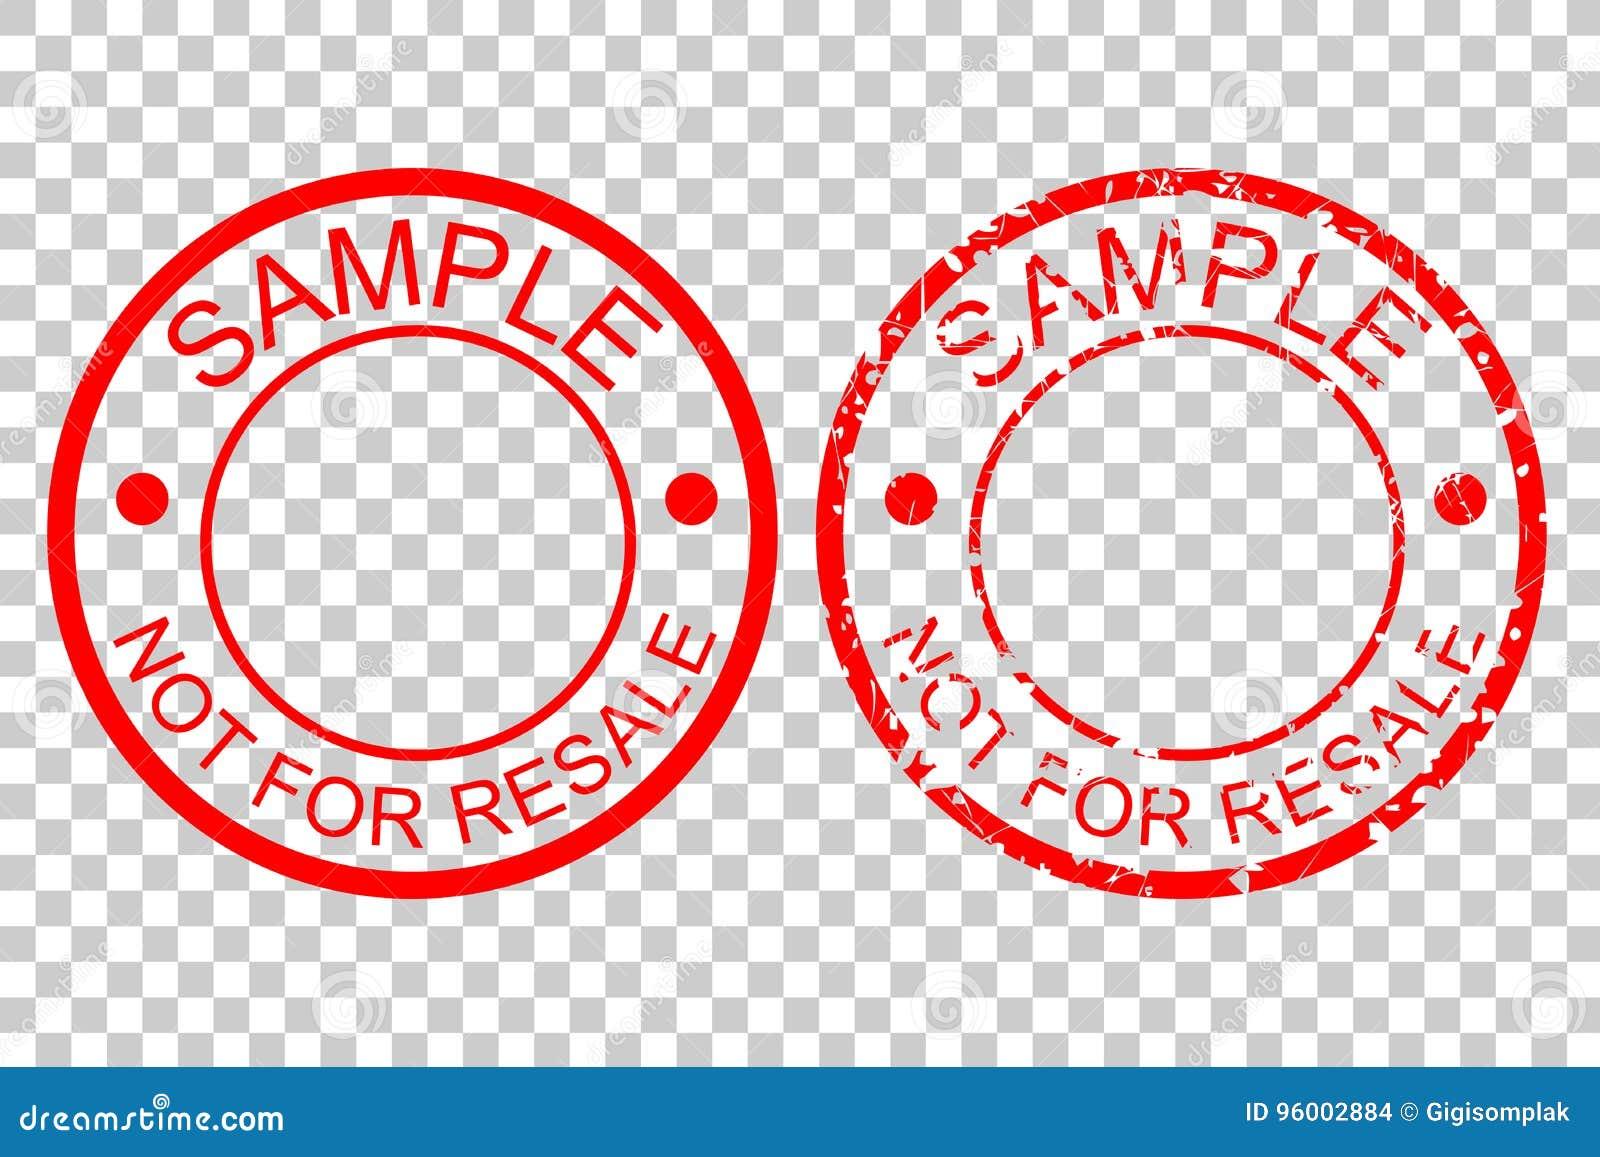 Sample rubber stamp stock vector. Illustration of illustration.